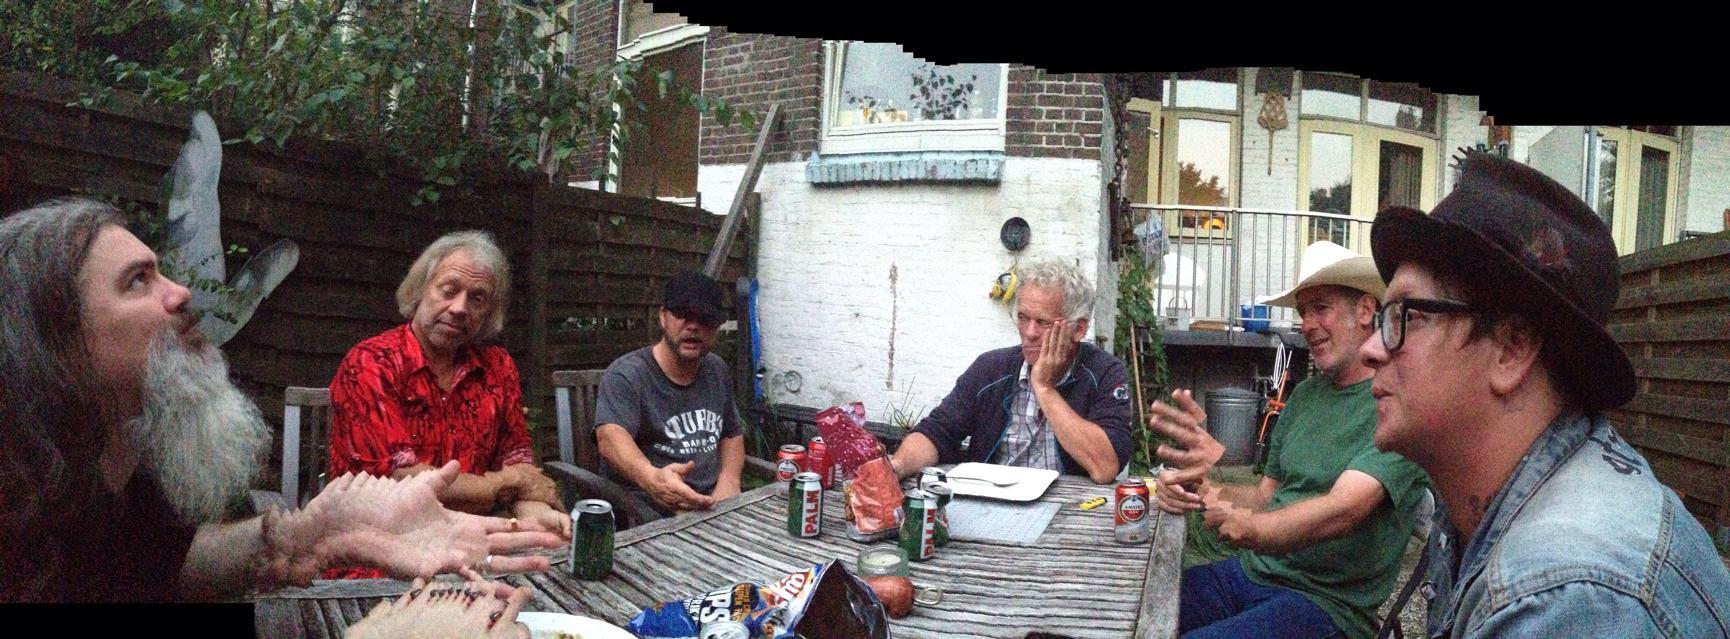 Slobberbone, Chase Ryan, Johnny B and the Big Bad